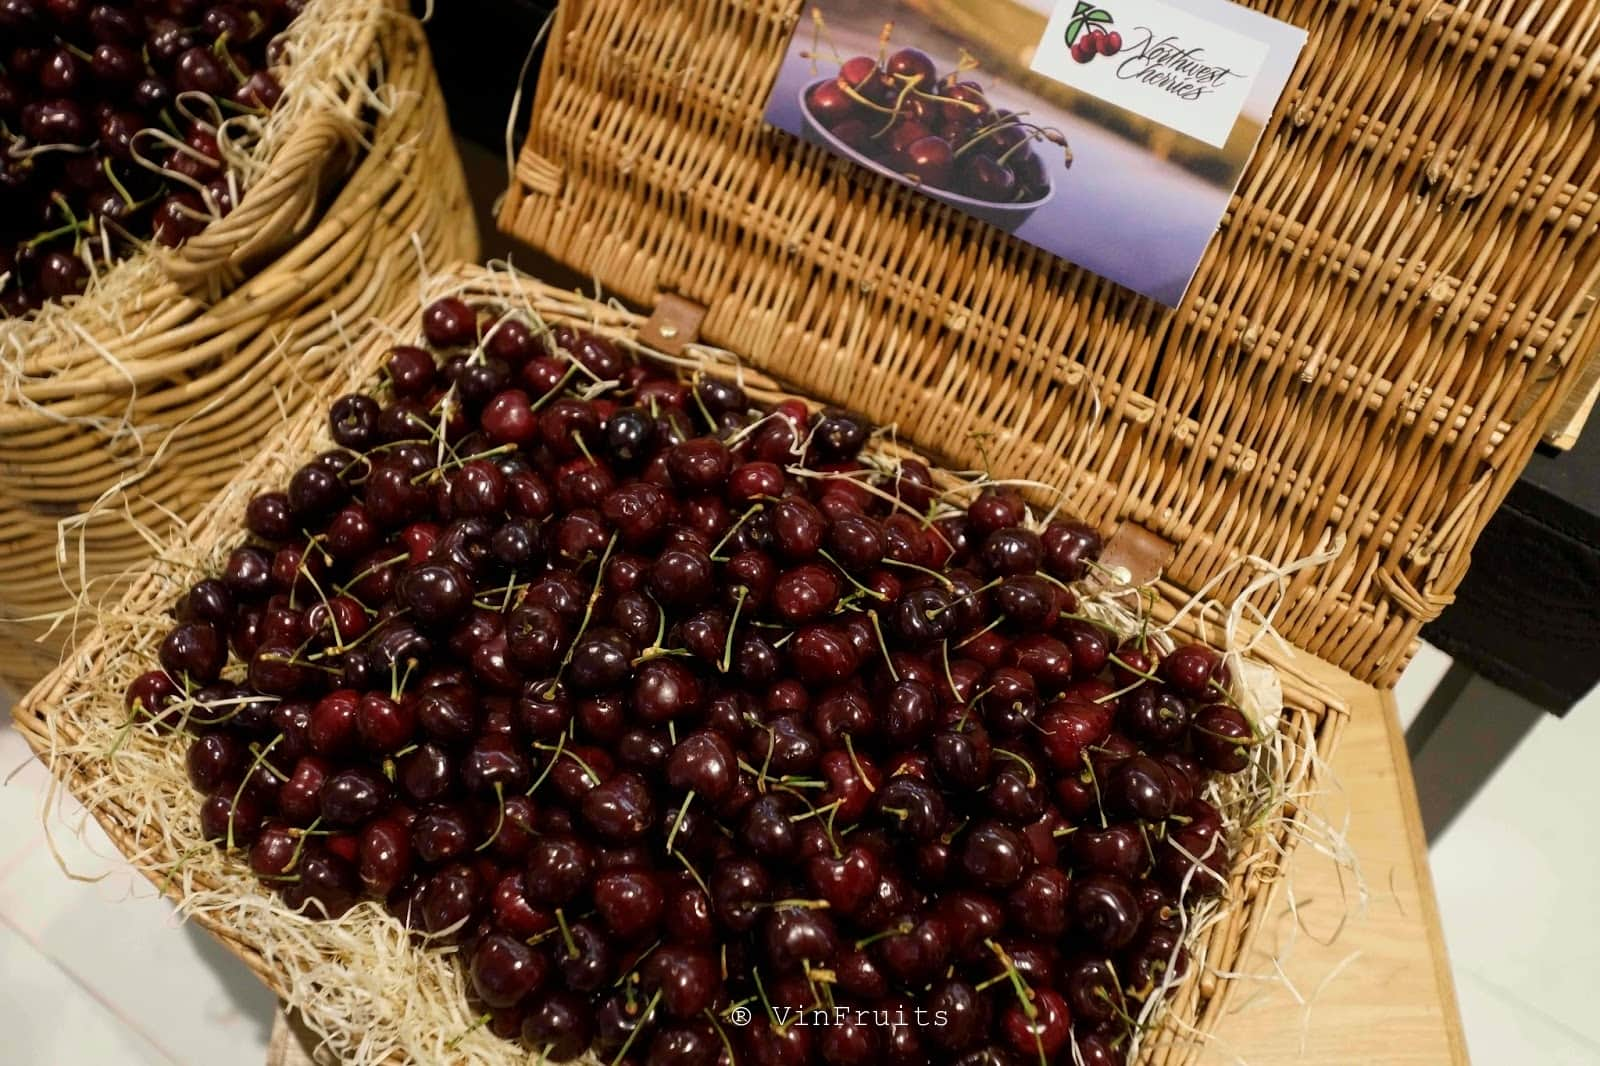 Quả cherry nhập khẩu từ Hoa Kỳ - Vinfruits